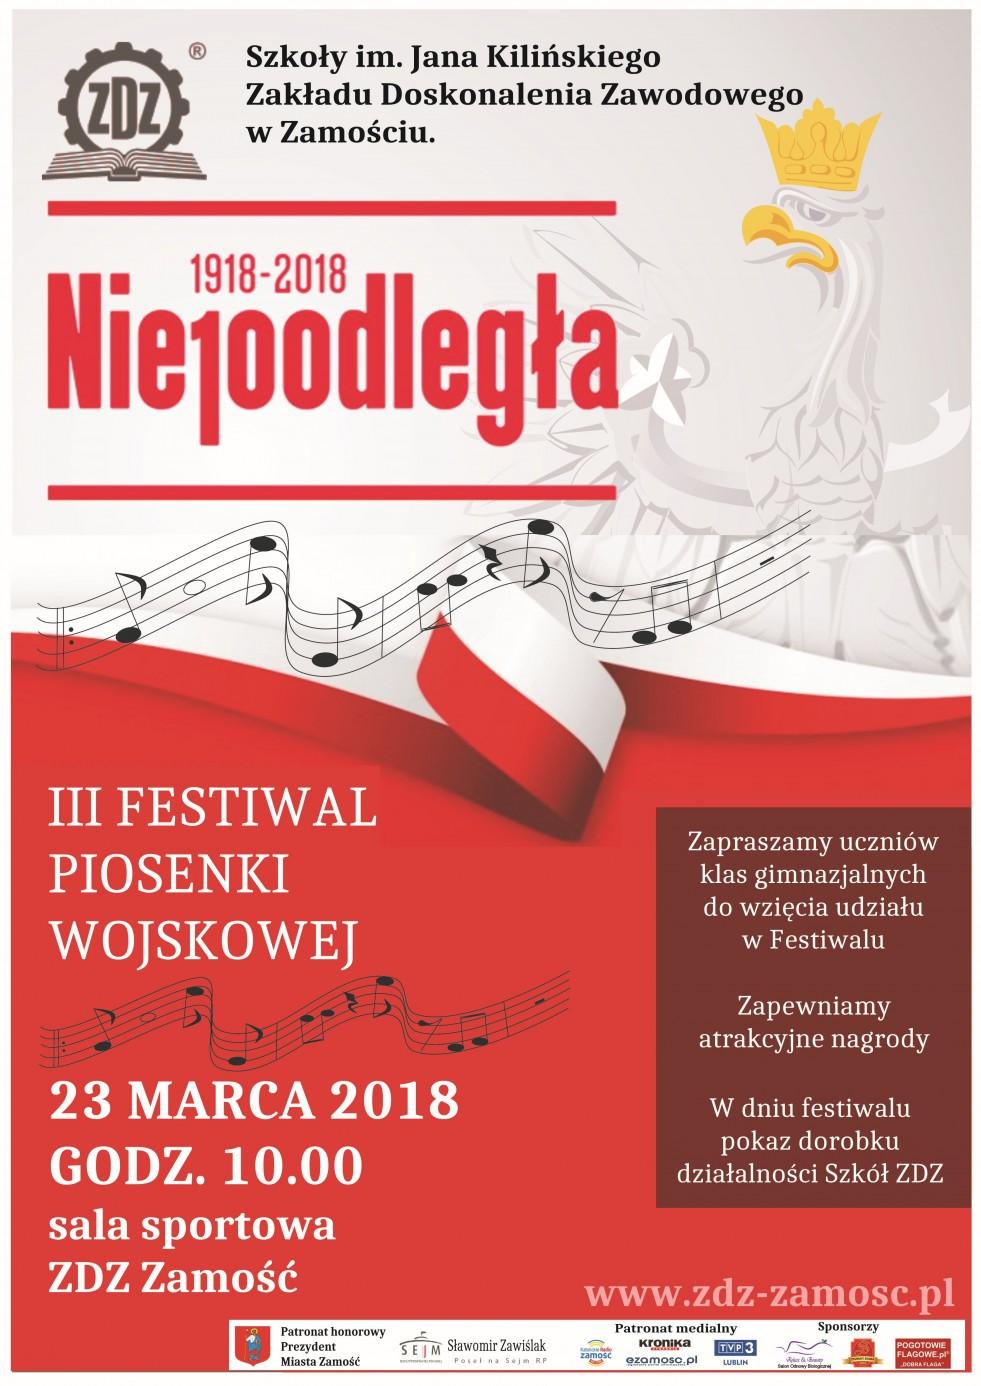 III Festiwal Piosenki Wojskowej